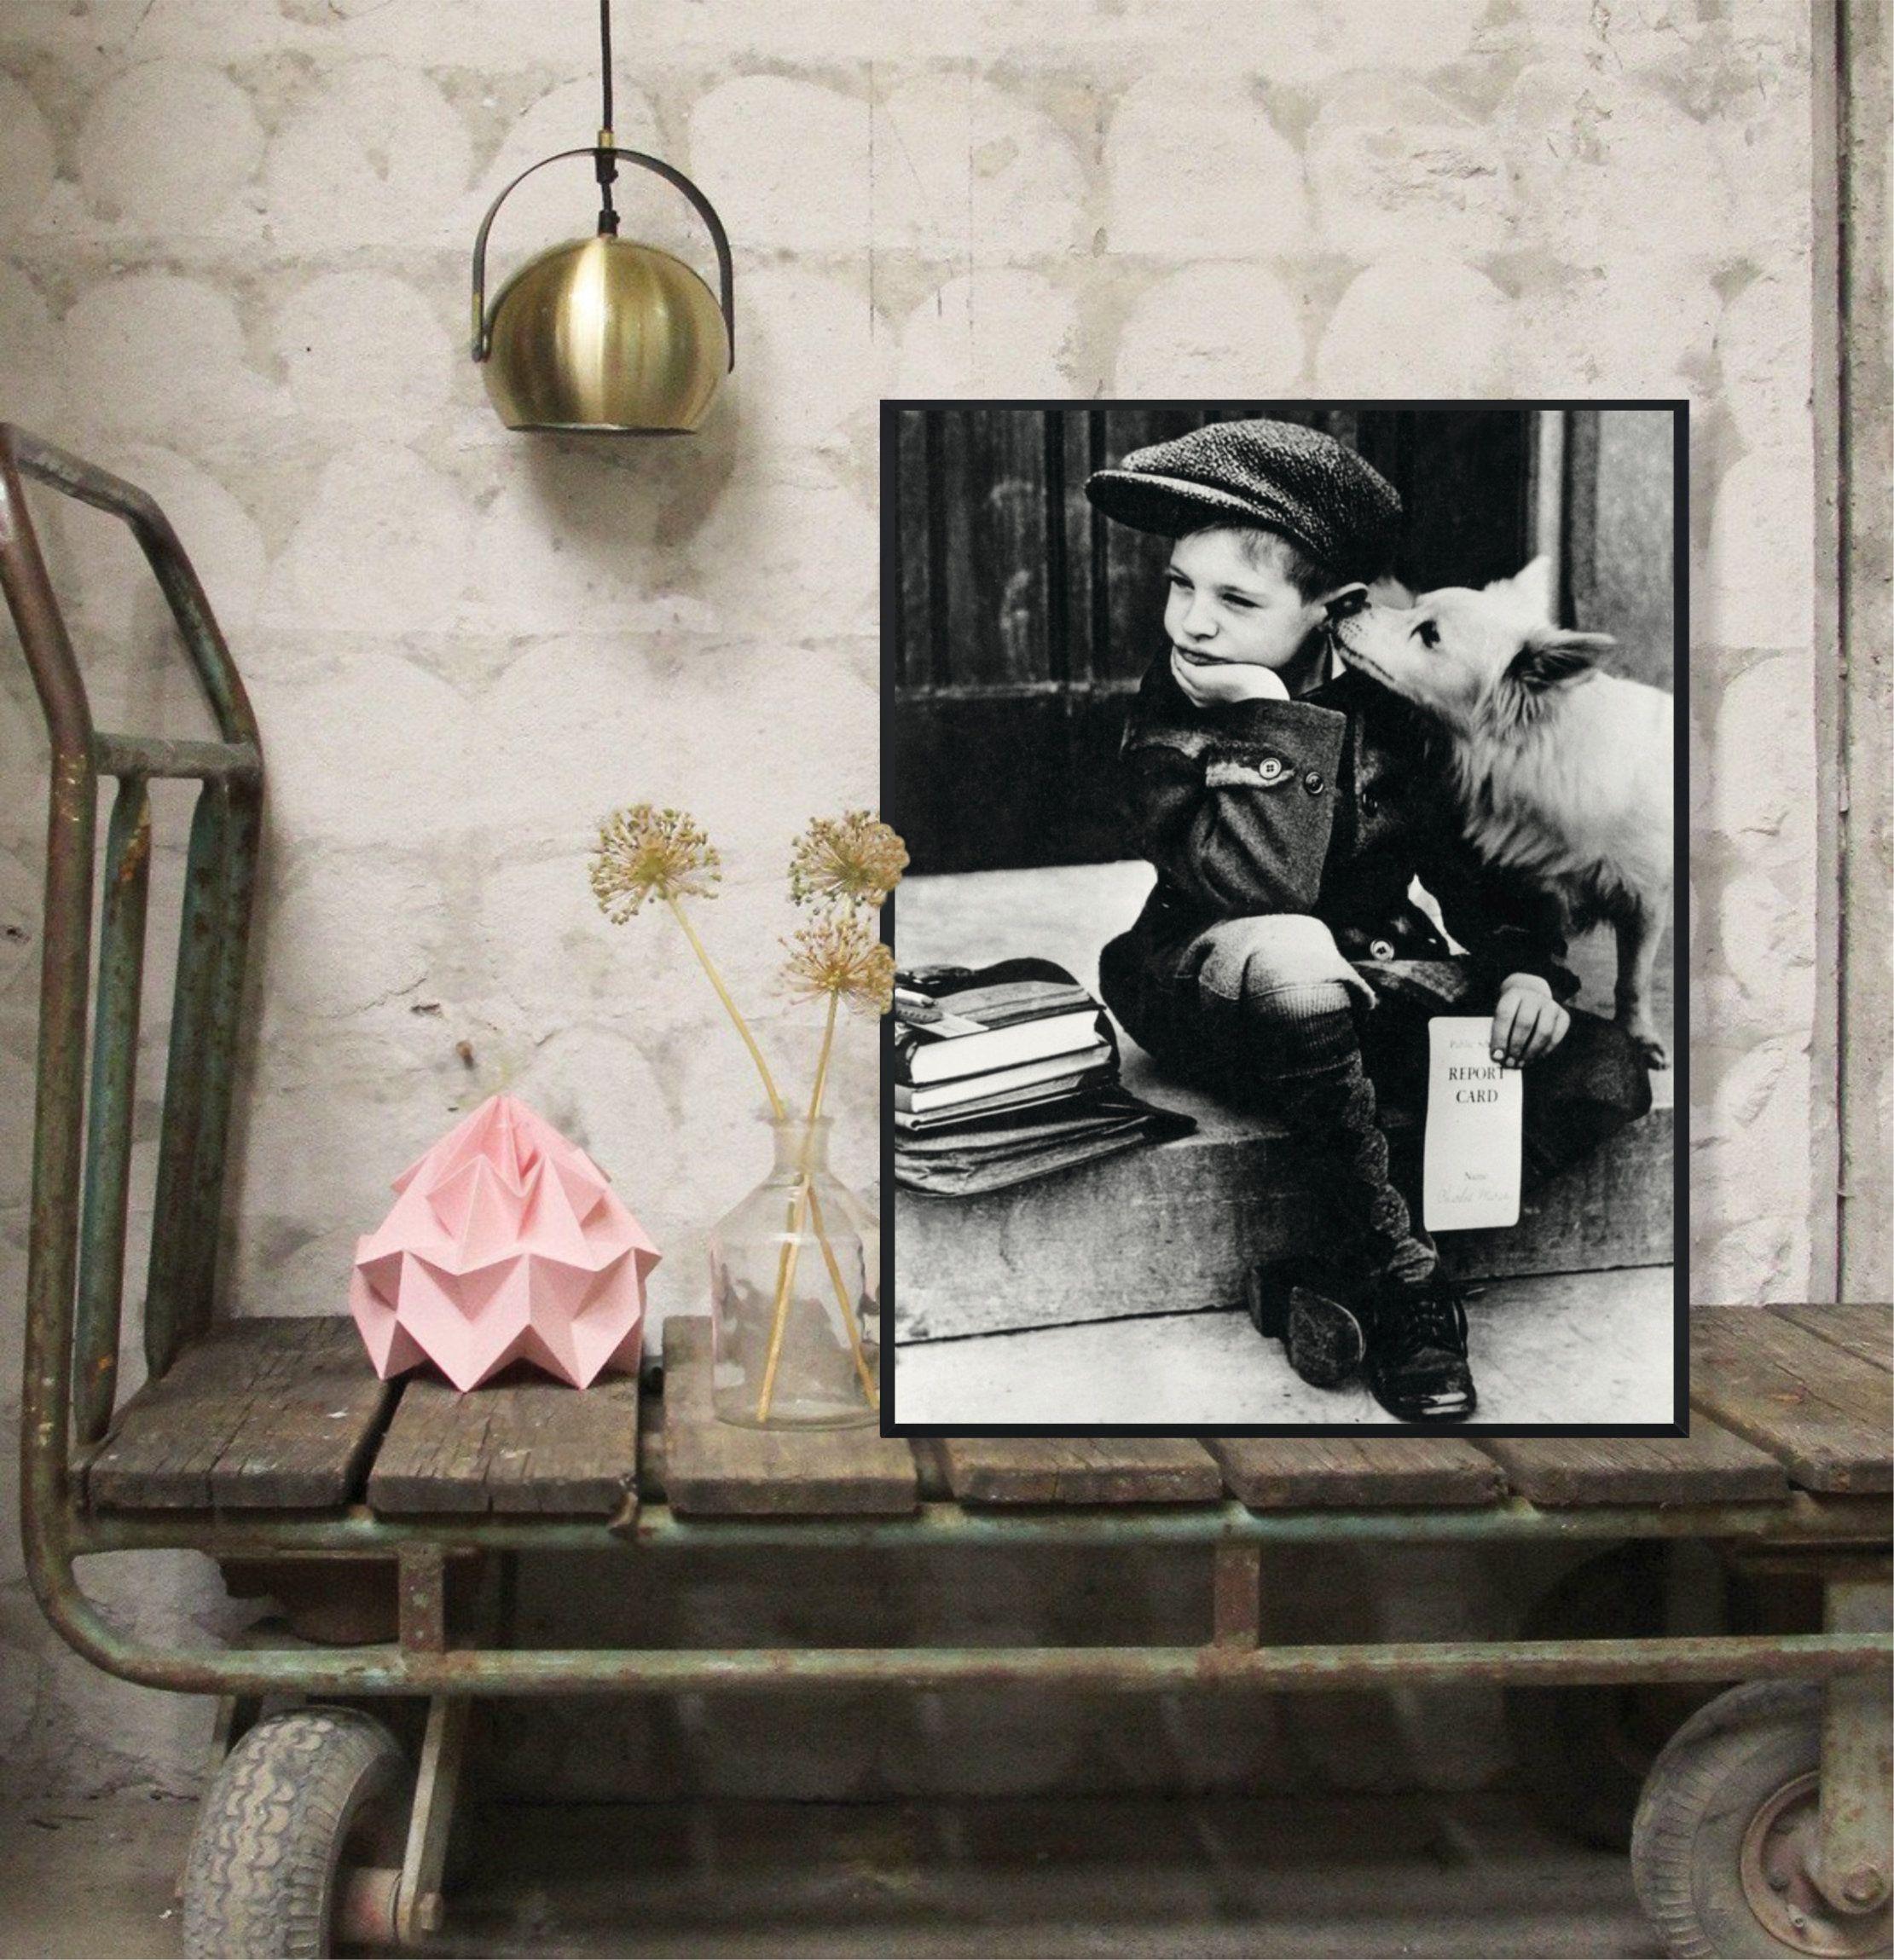 Vintage Fashion Wall Photography Classic Photo Poster French Boy 1939 Photograph Interior Design Home Decor Retro Style Printable Fashion Wall Art Photography Vintage Fashion